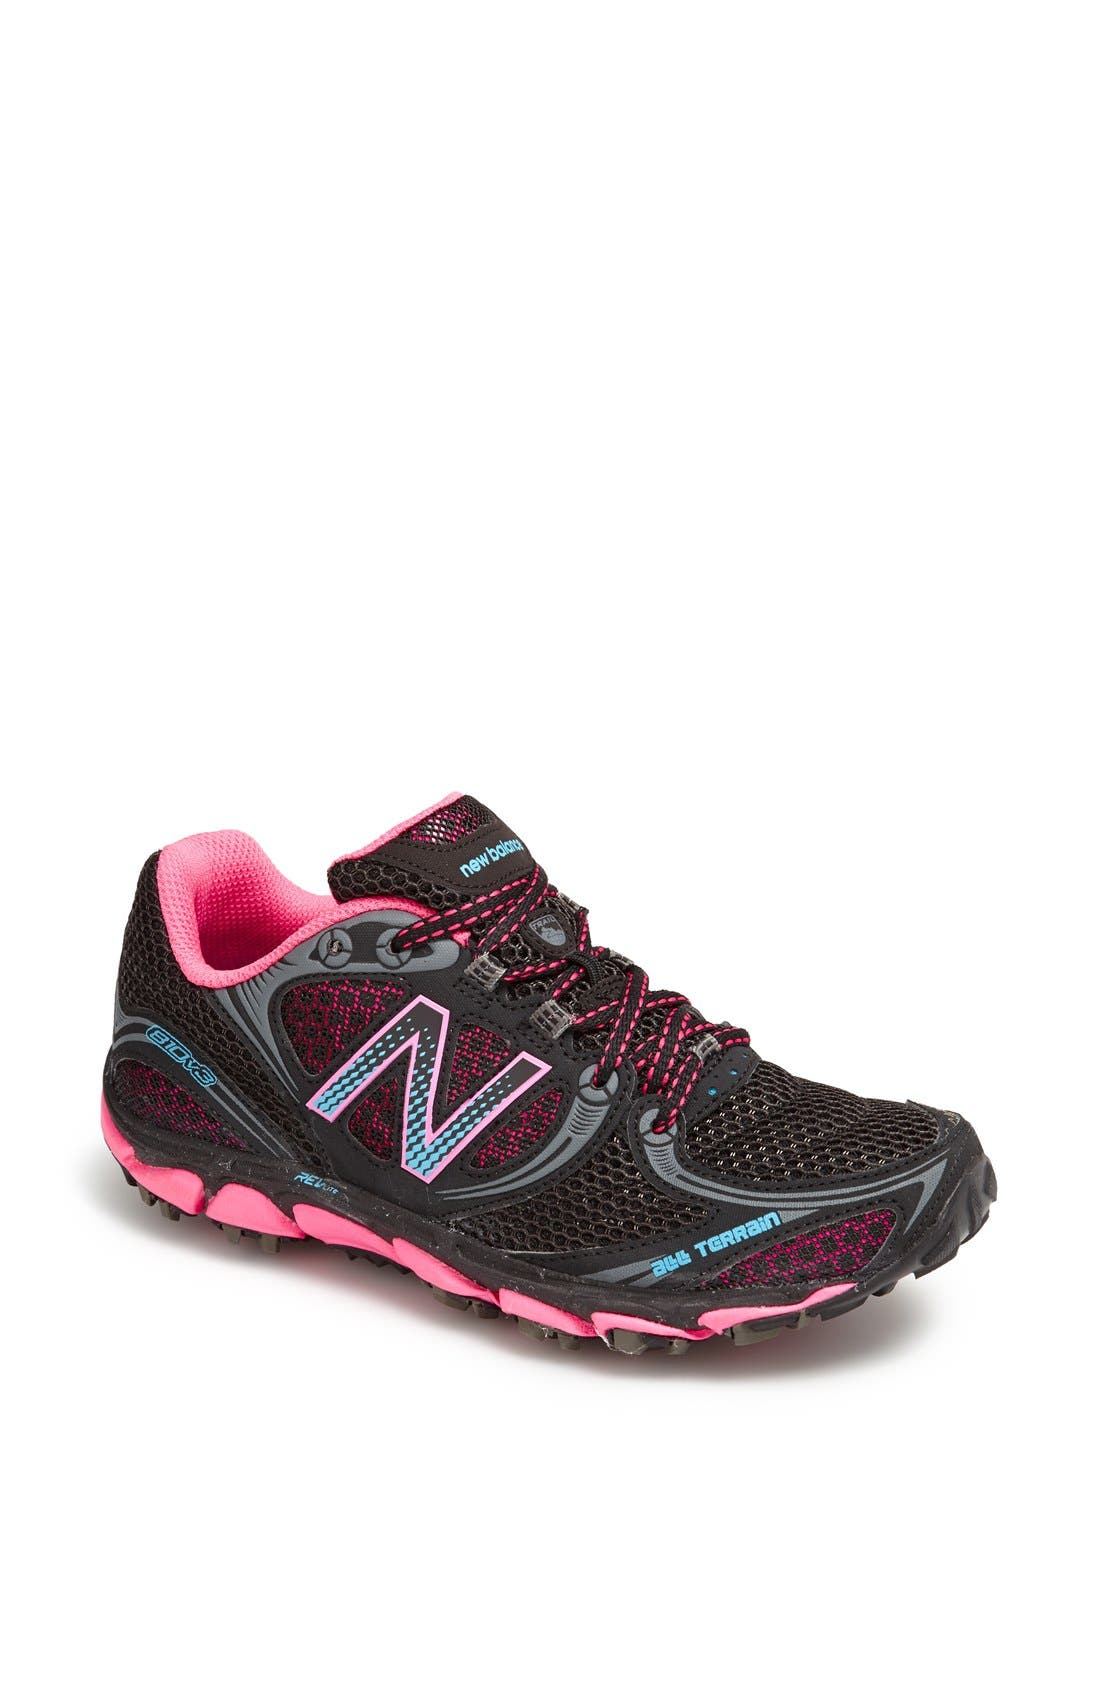 Main Image - New Balance '810' Trail Running Shoe